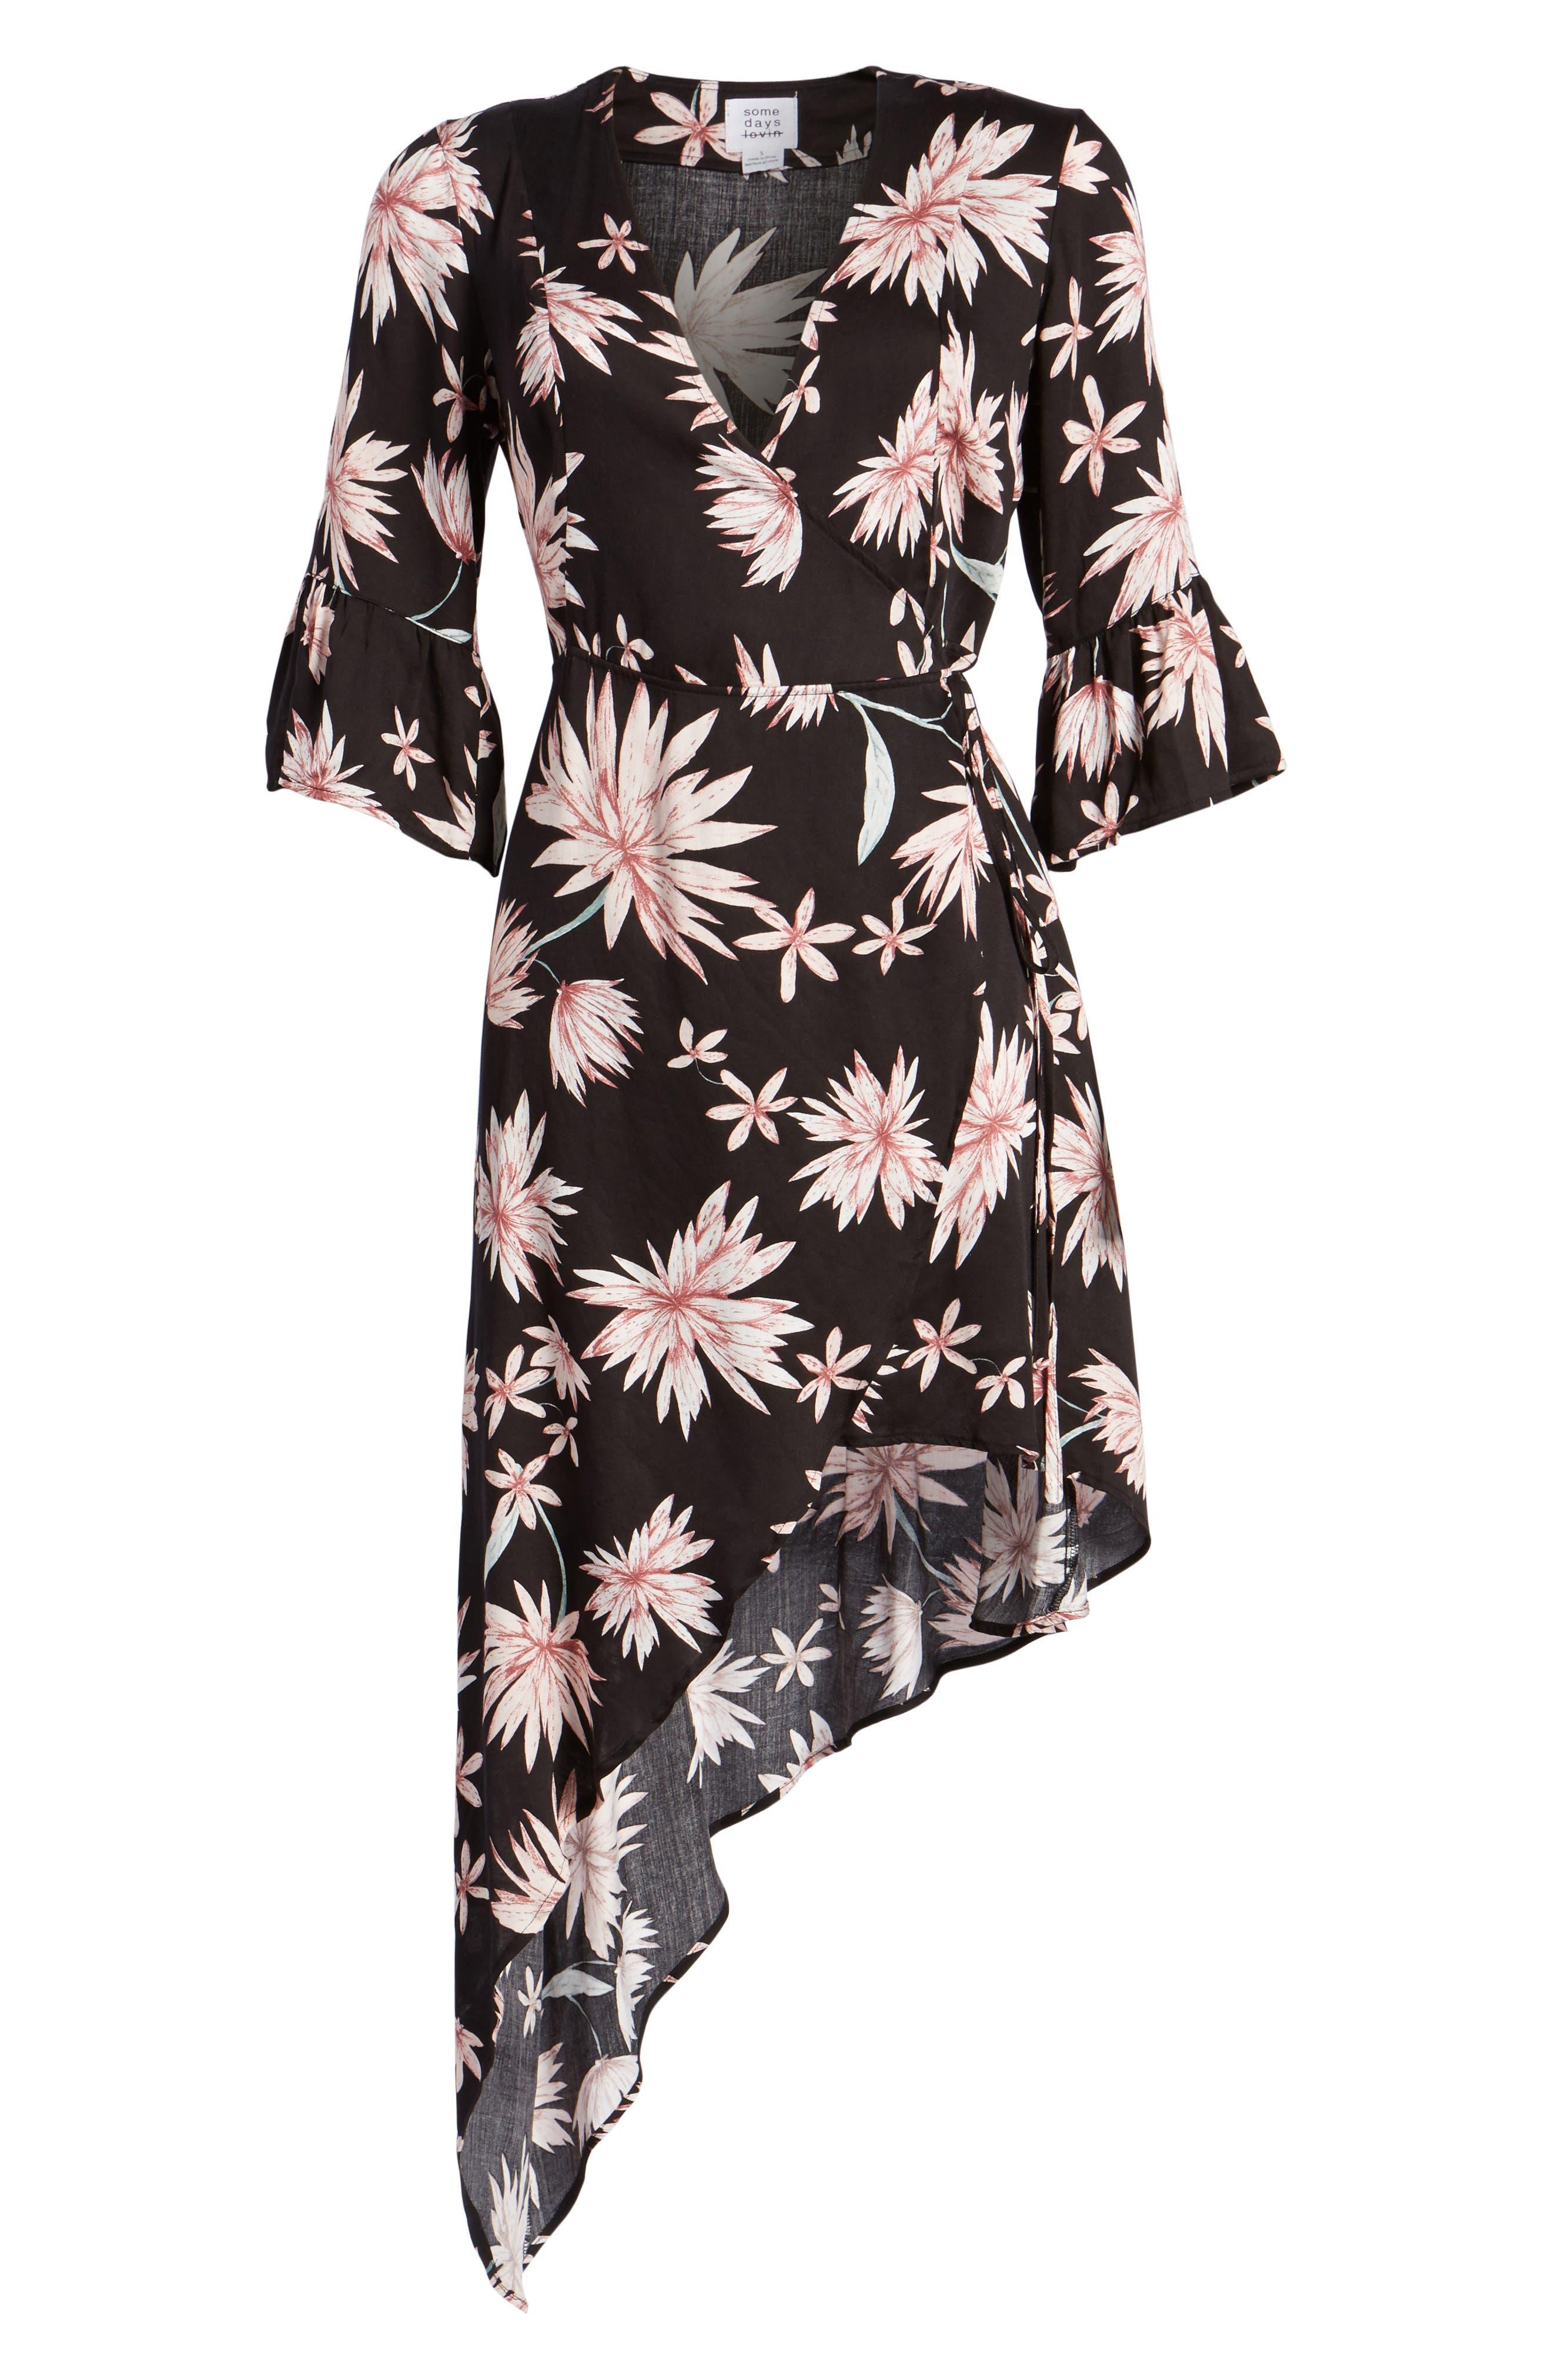 Shades of Dawn Wrap Dress,                             Alternate thumbnail 6, color,                             402